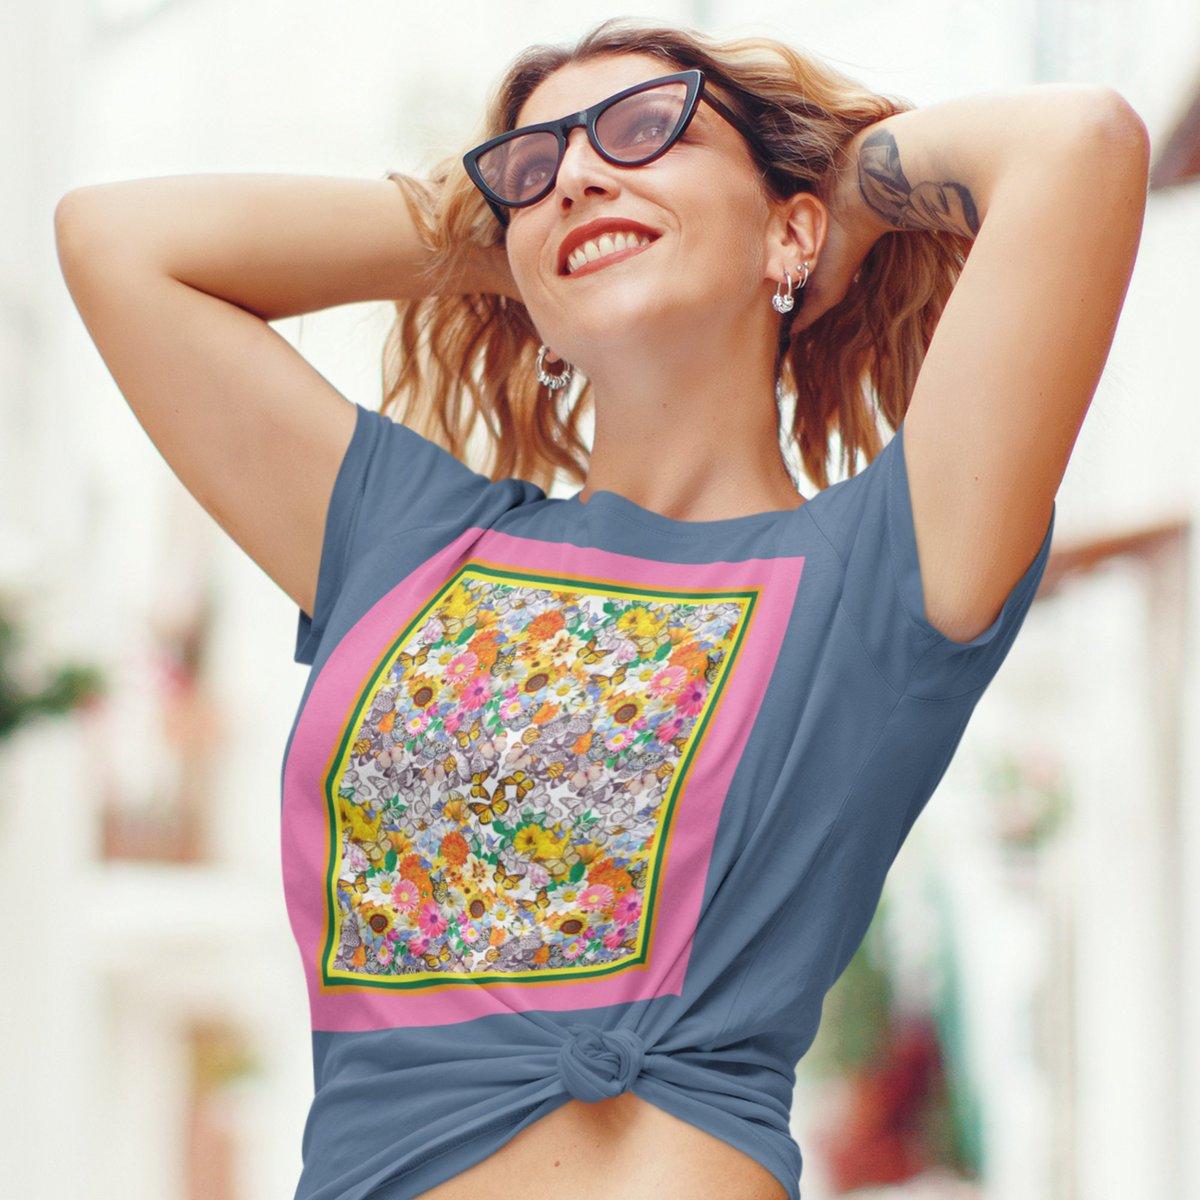 65 MCMLXV Women's Butterflies & Flowers Graphic T-Shirt  #65mcmlxv #shopifypicks #etsyseller #etsystore #instastyle #instafashion #tshirt #tshirtdesign #tshirts #moda #shirt #tees #tshirtstore #modafeminina #tshirtshop #teeshirt #tshirtslovers #tshirtprint #flowers #butterflies